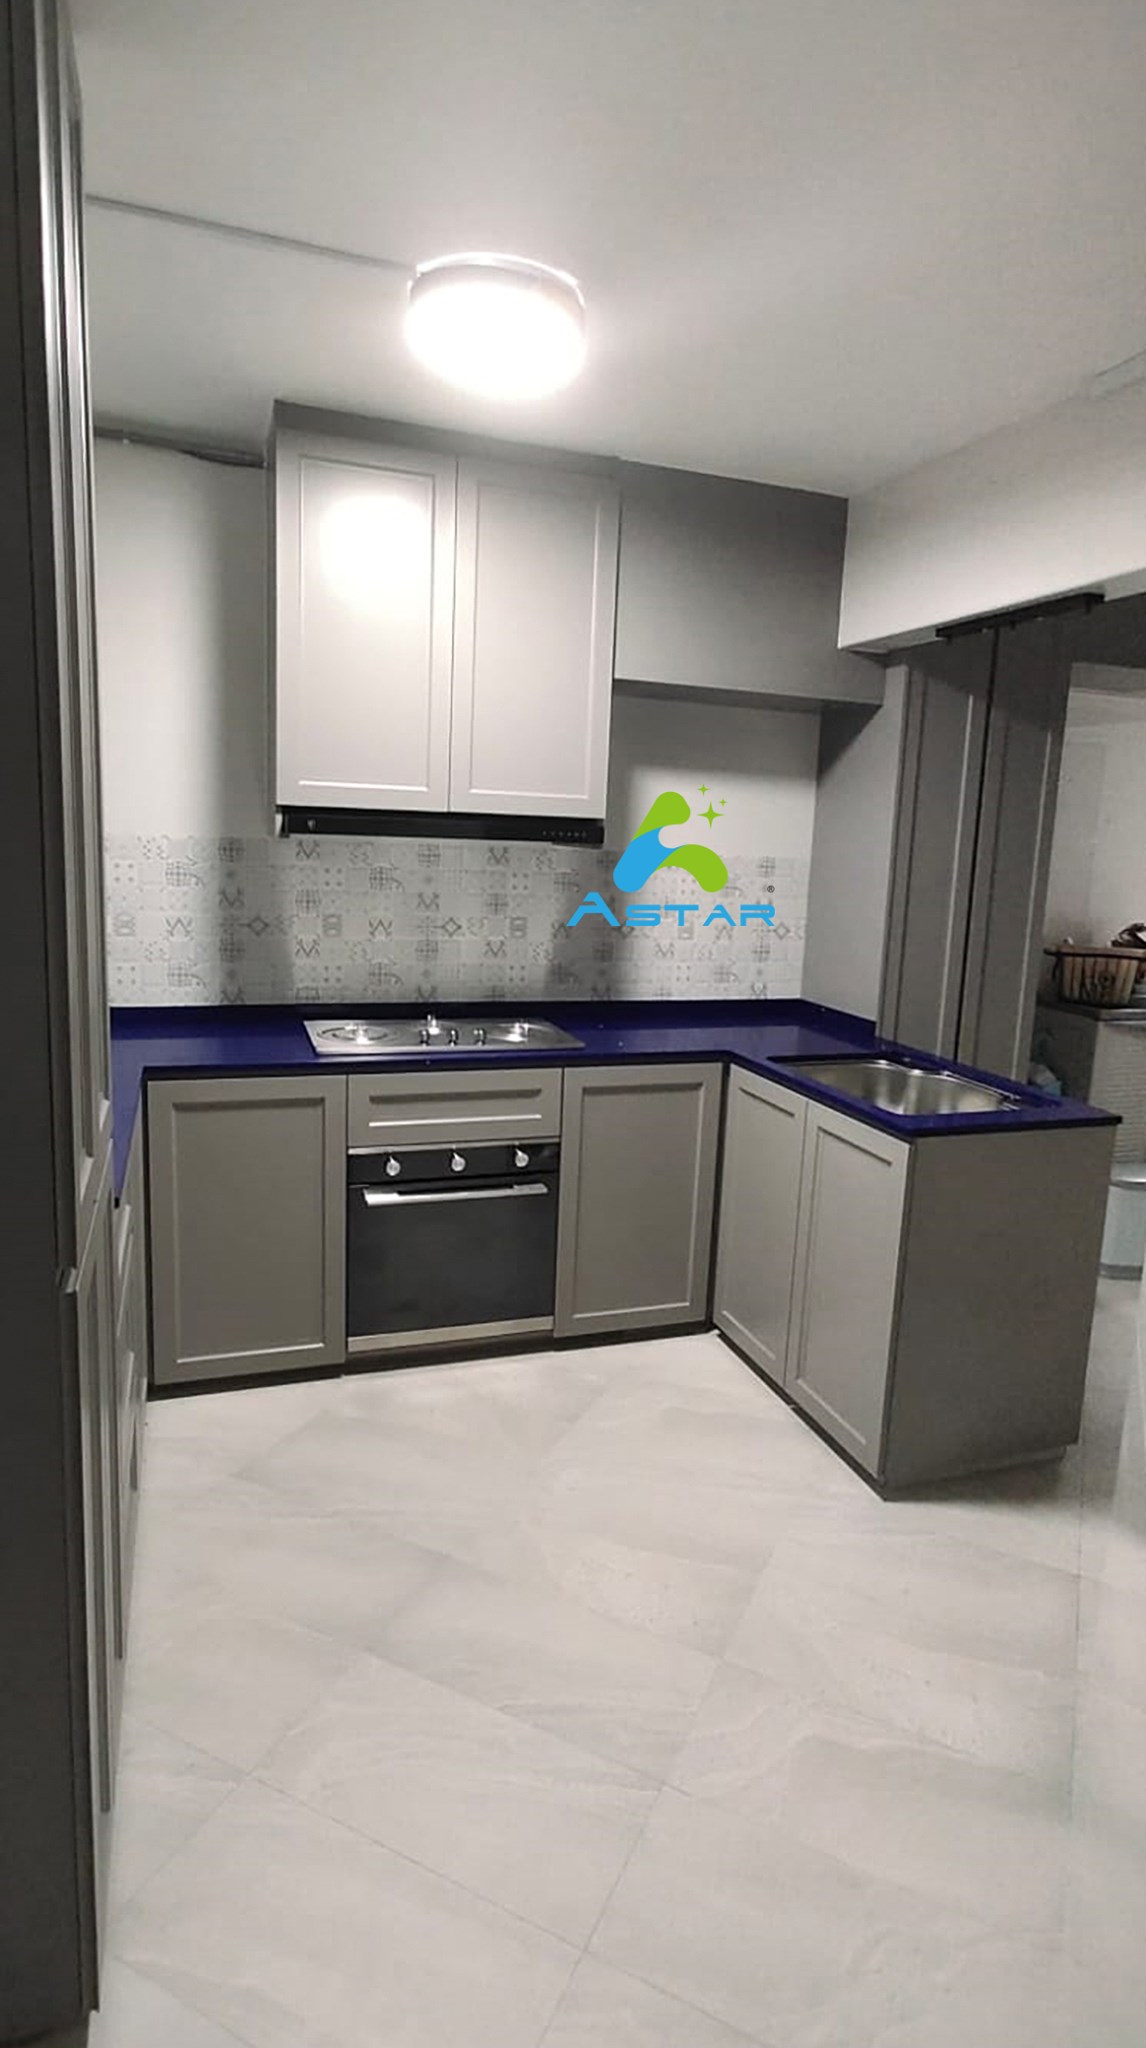 astar furnishing complete projects aluminium kitchen cabinet vanity cabinet wardrobe 109B Depot Road 1